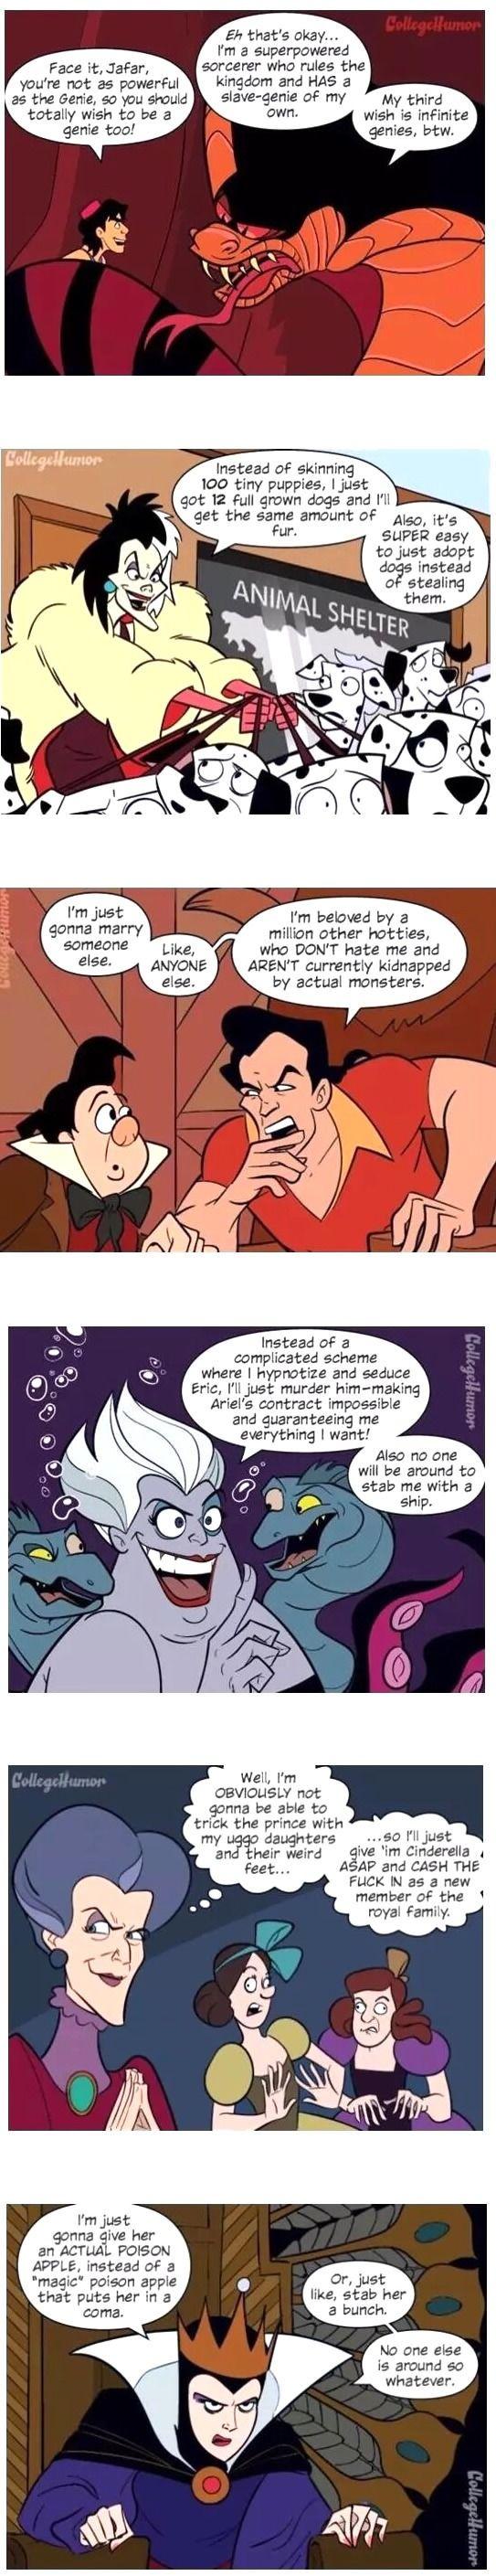 If Disney Villains Were Actually Smart... xD